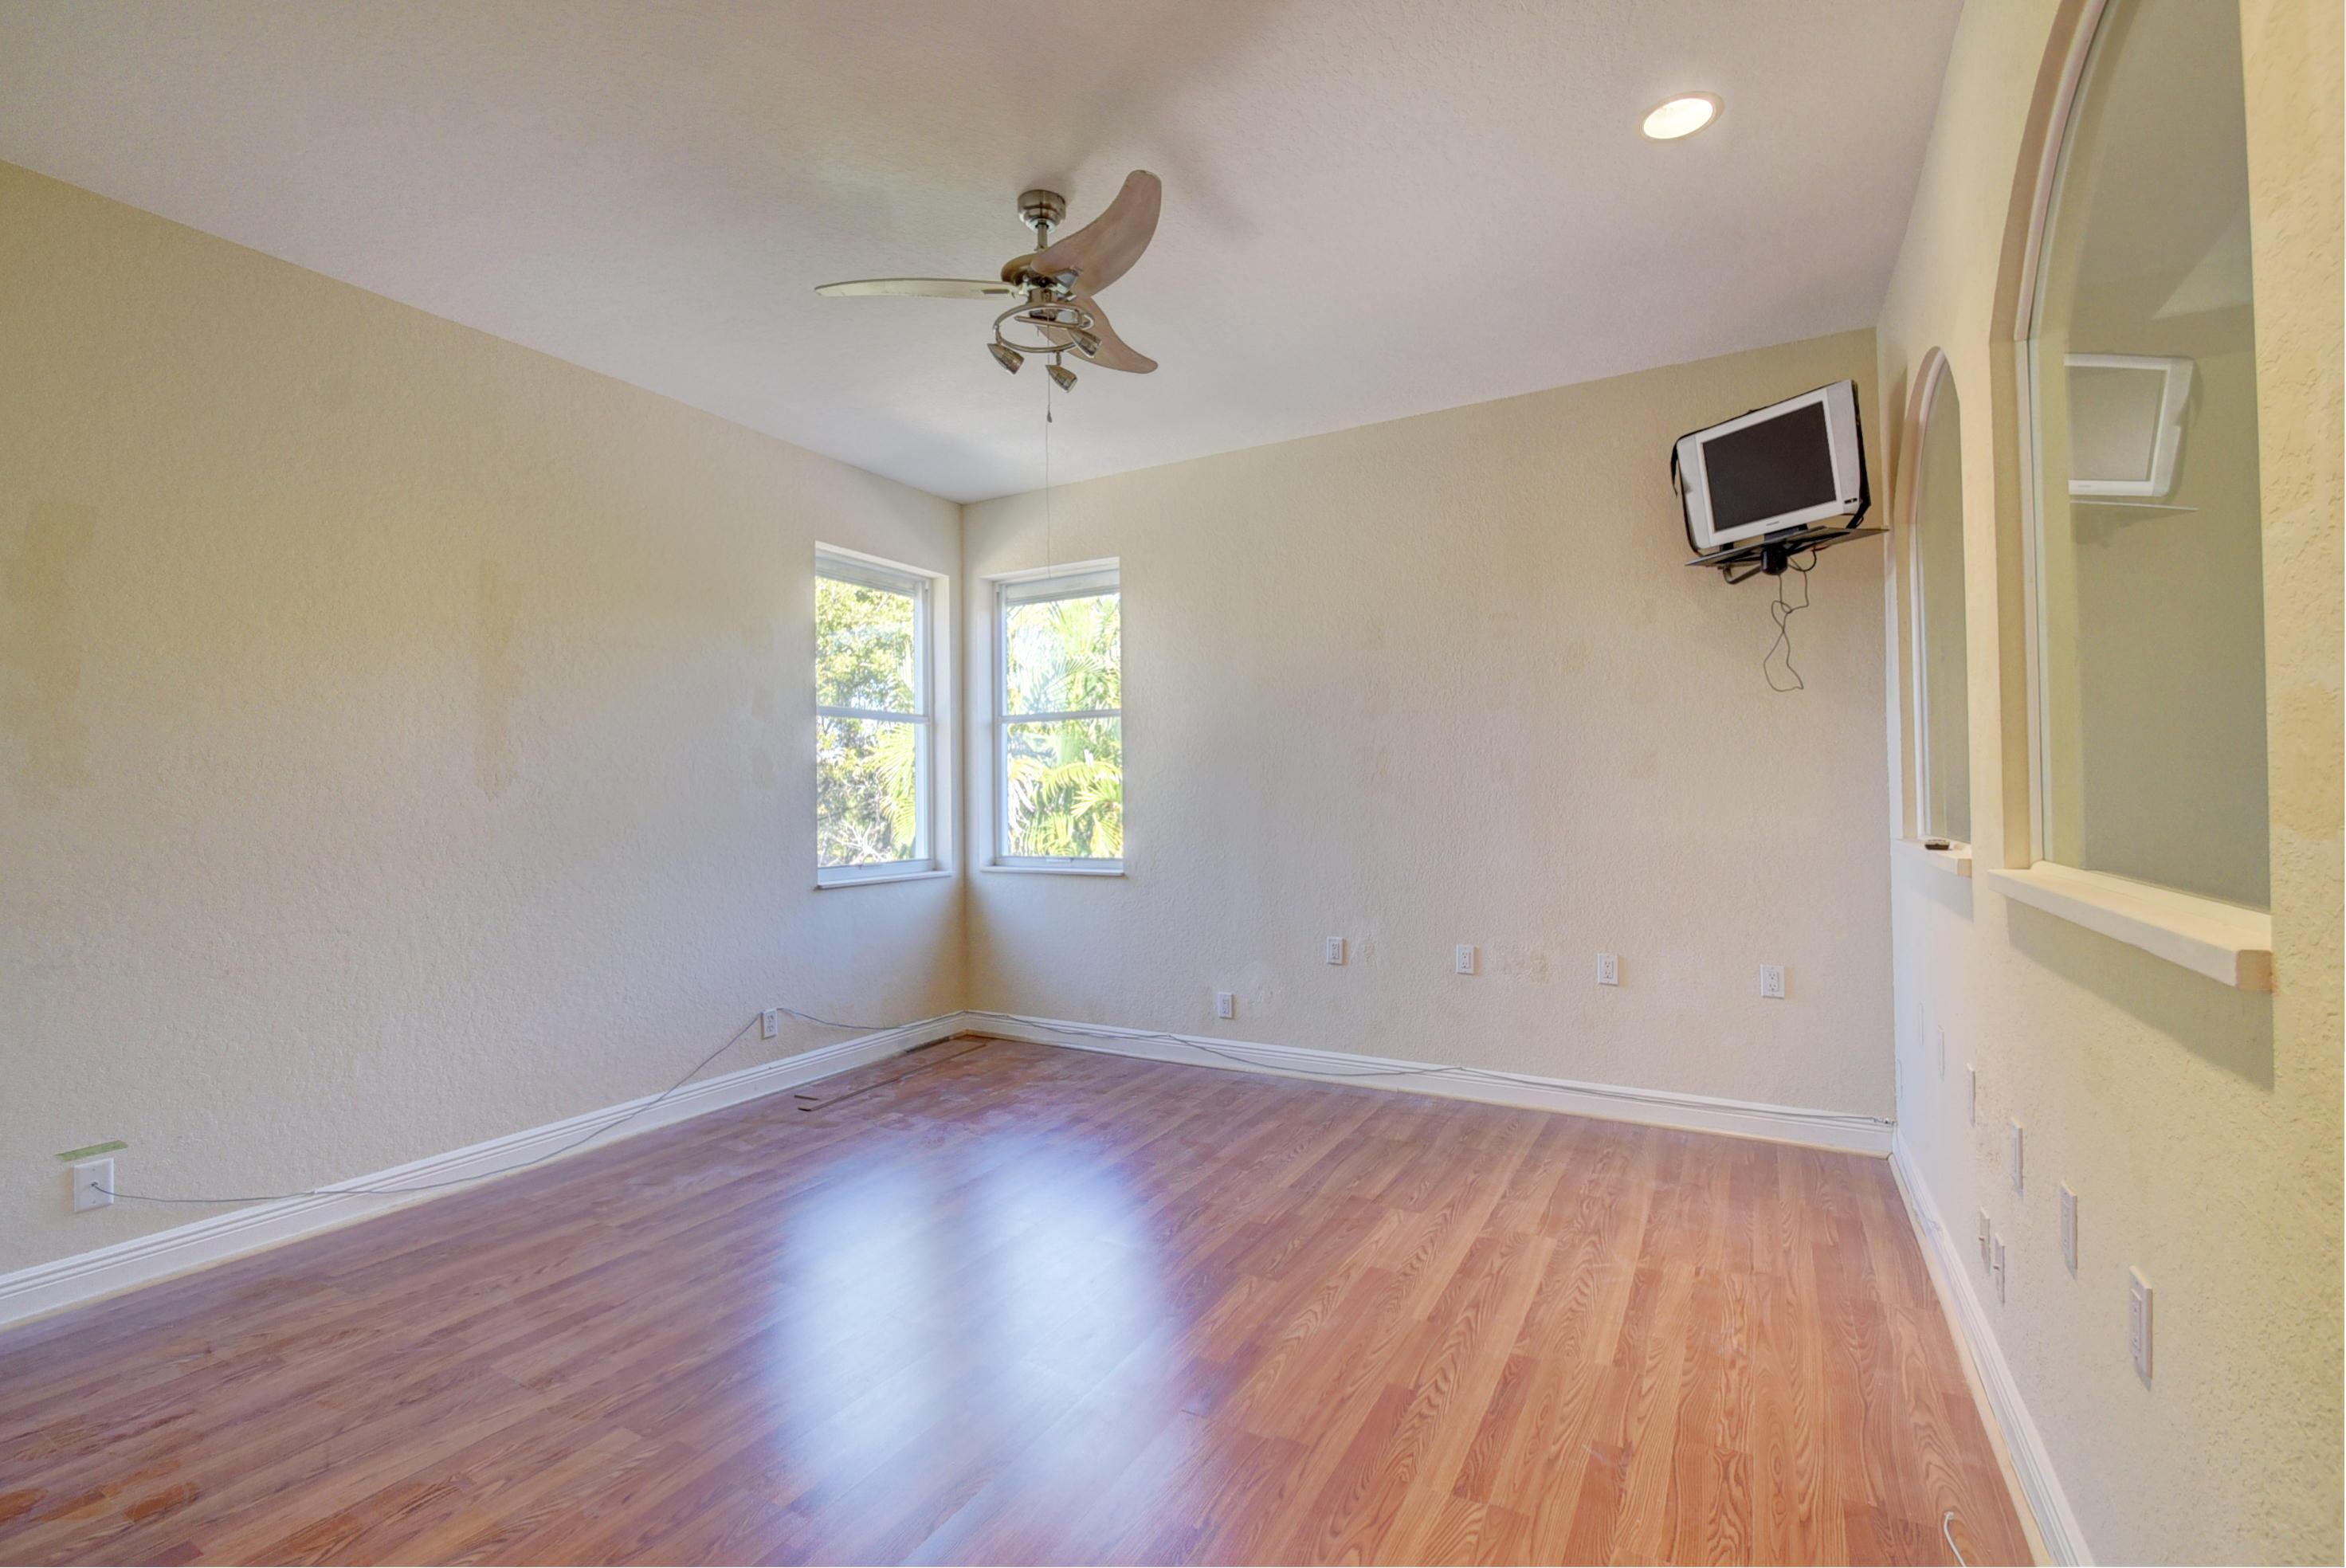 12365 Equine Lane, Wellington, Florida 33414, 5 Bedrooms Bedrooms, ,5 BathroomsBathrooms,Single Family,For Sale,Equine,RX-10502794